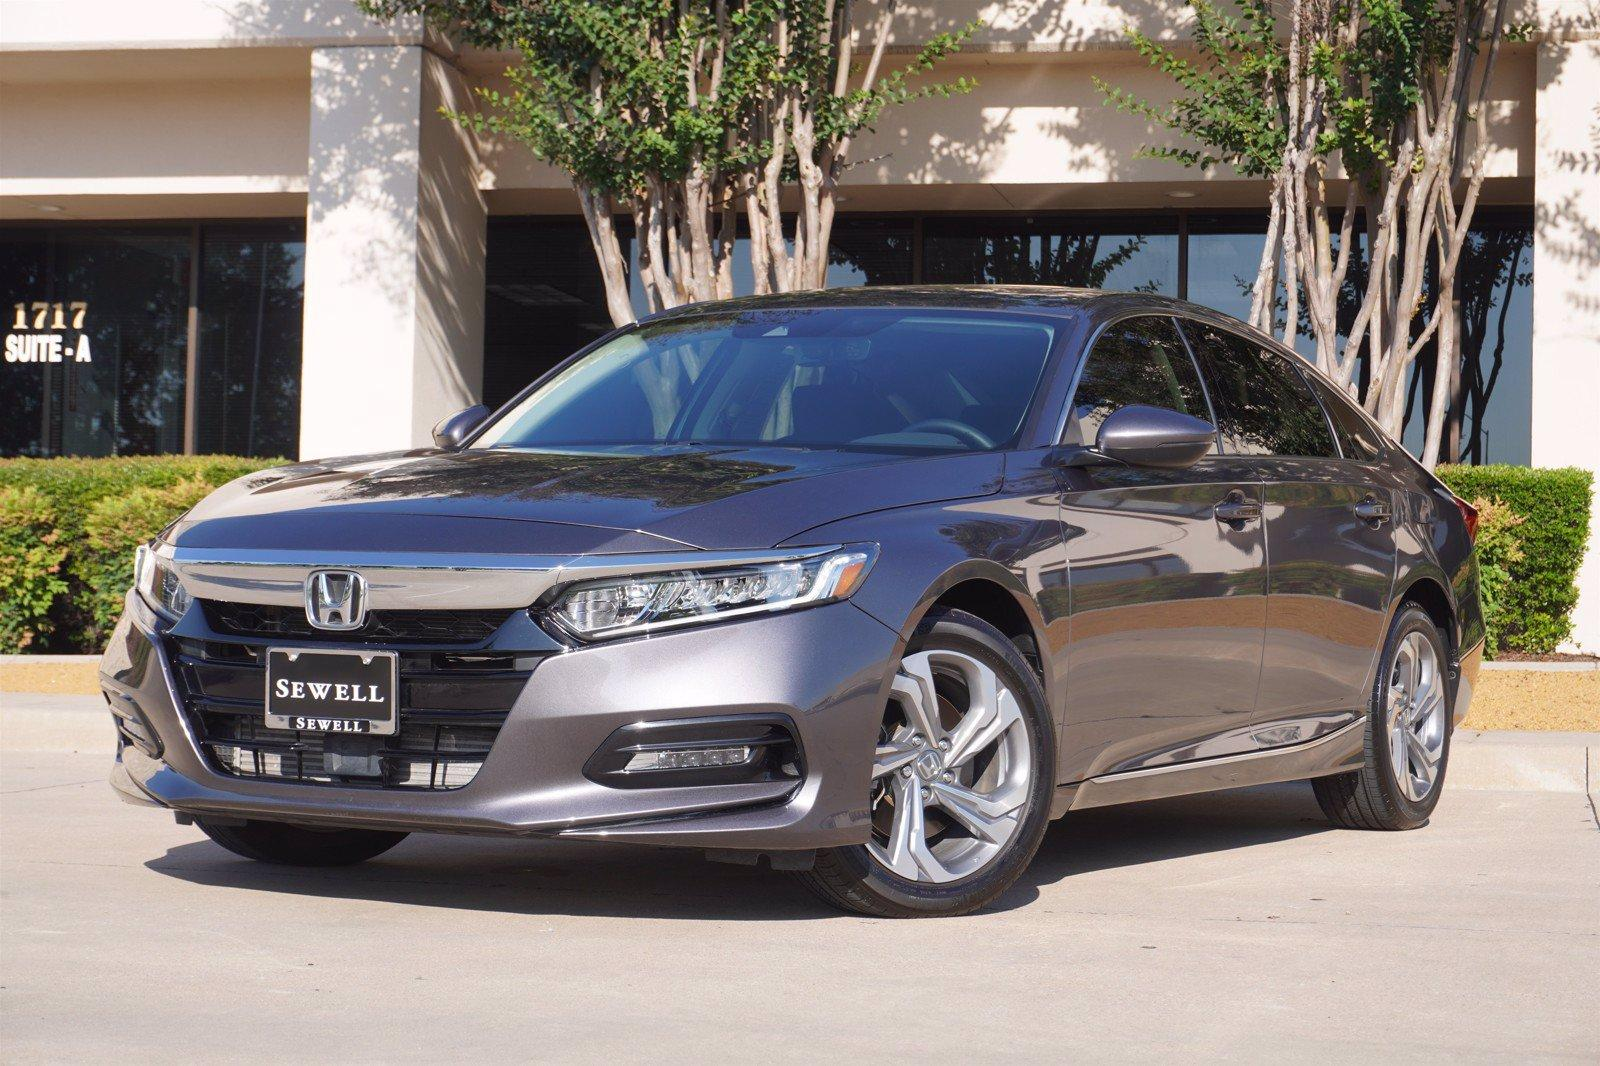 2019 Honda Accord Sedan Vehicle Photo in Grapevine, TX 76051